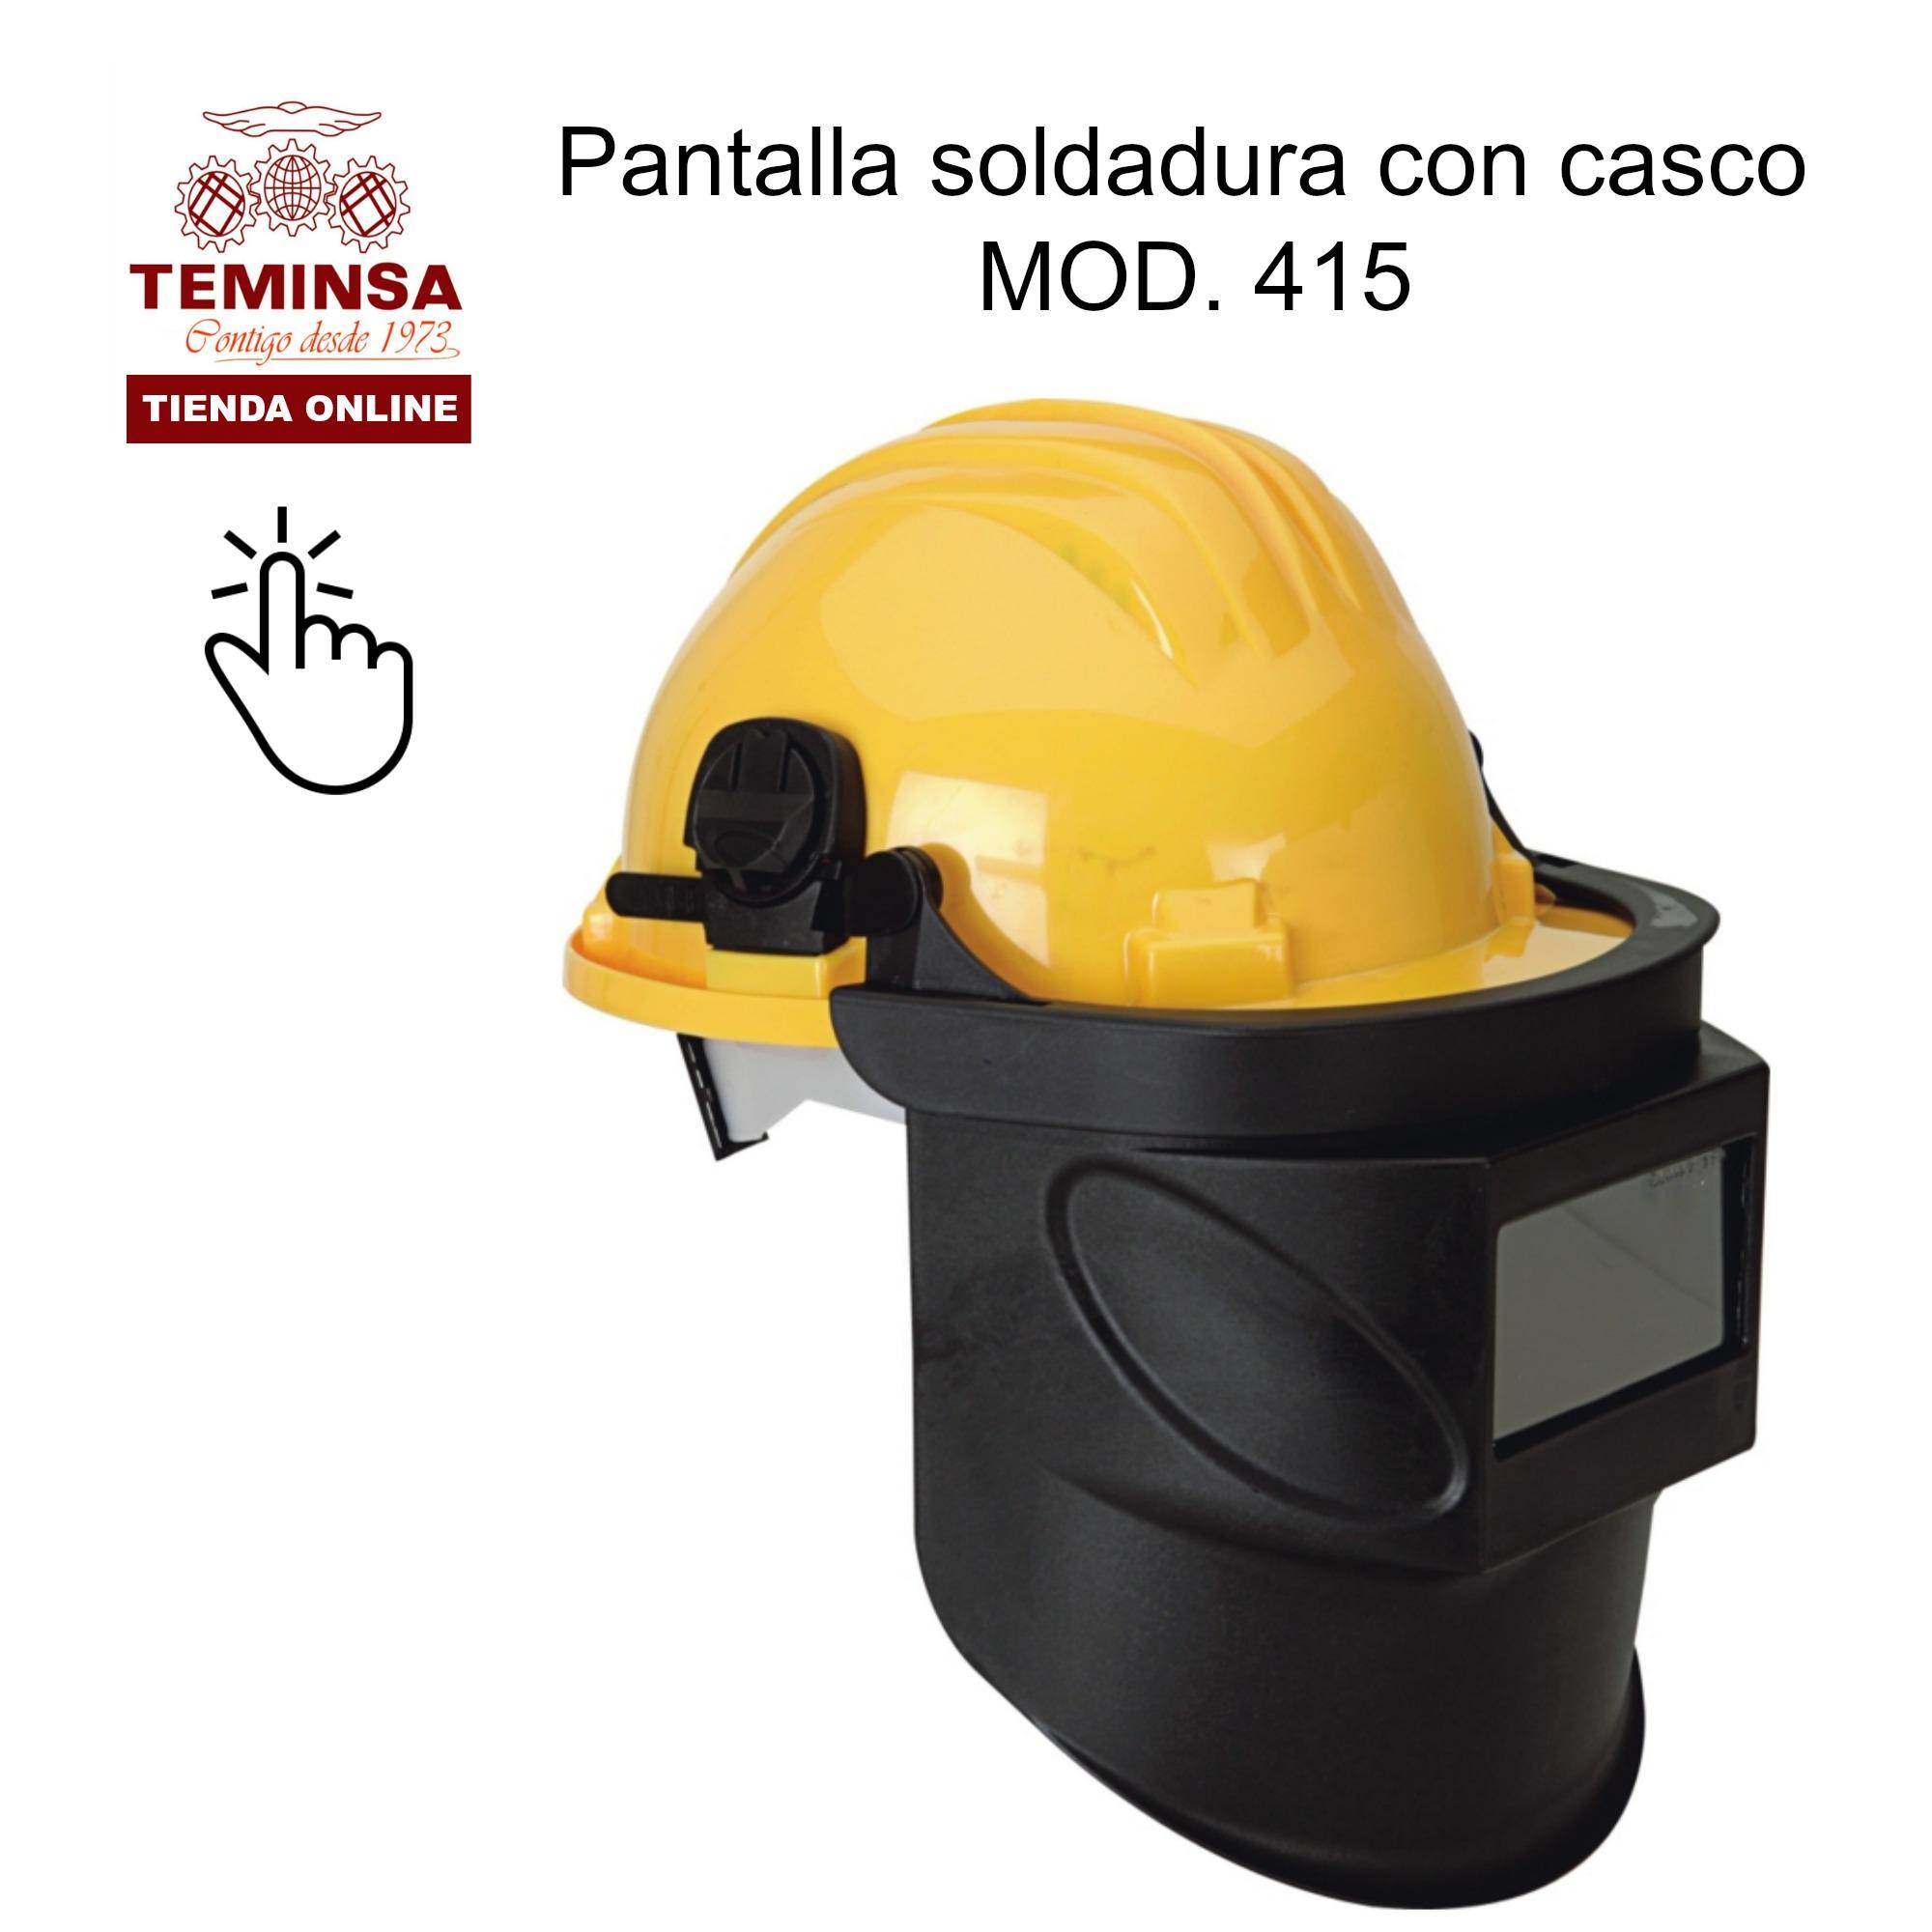 Pantalla Soldador acoplada a casco de industria modelo 415 Teminsa Online